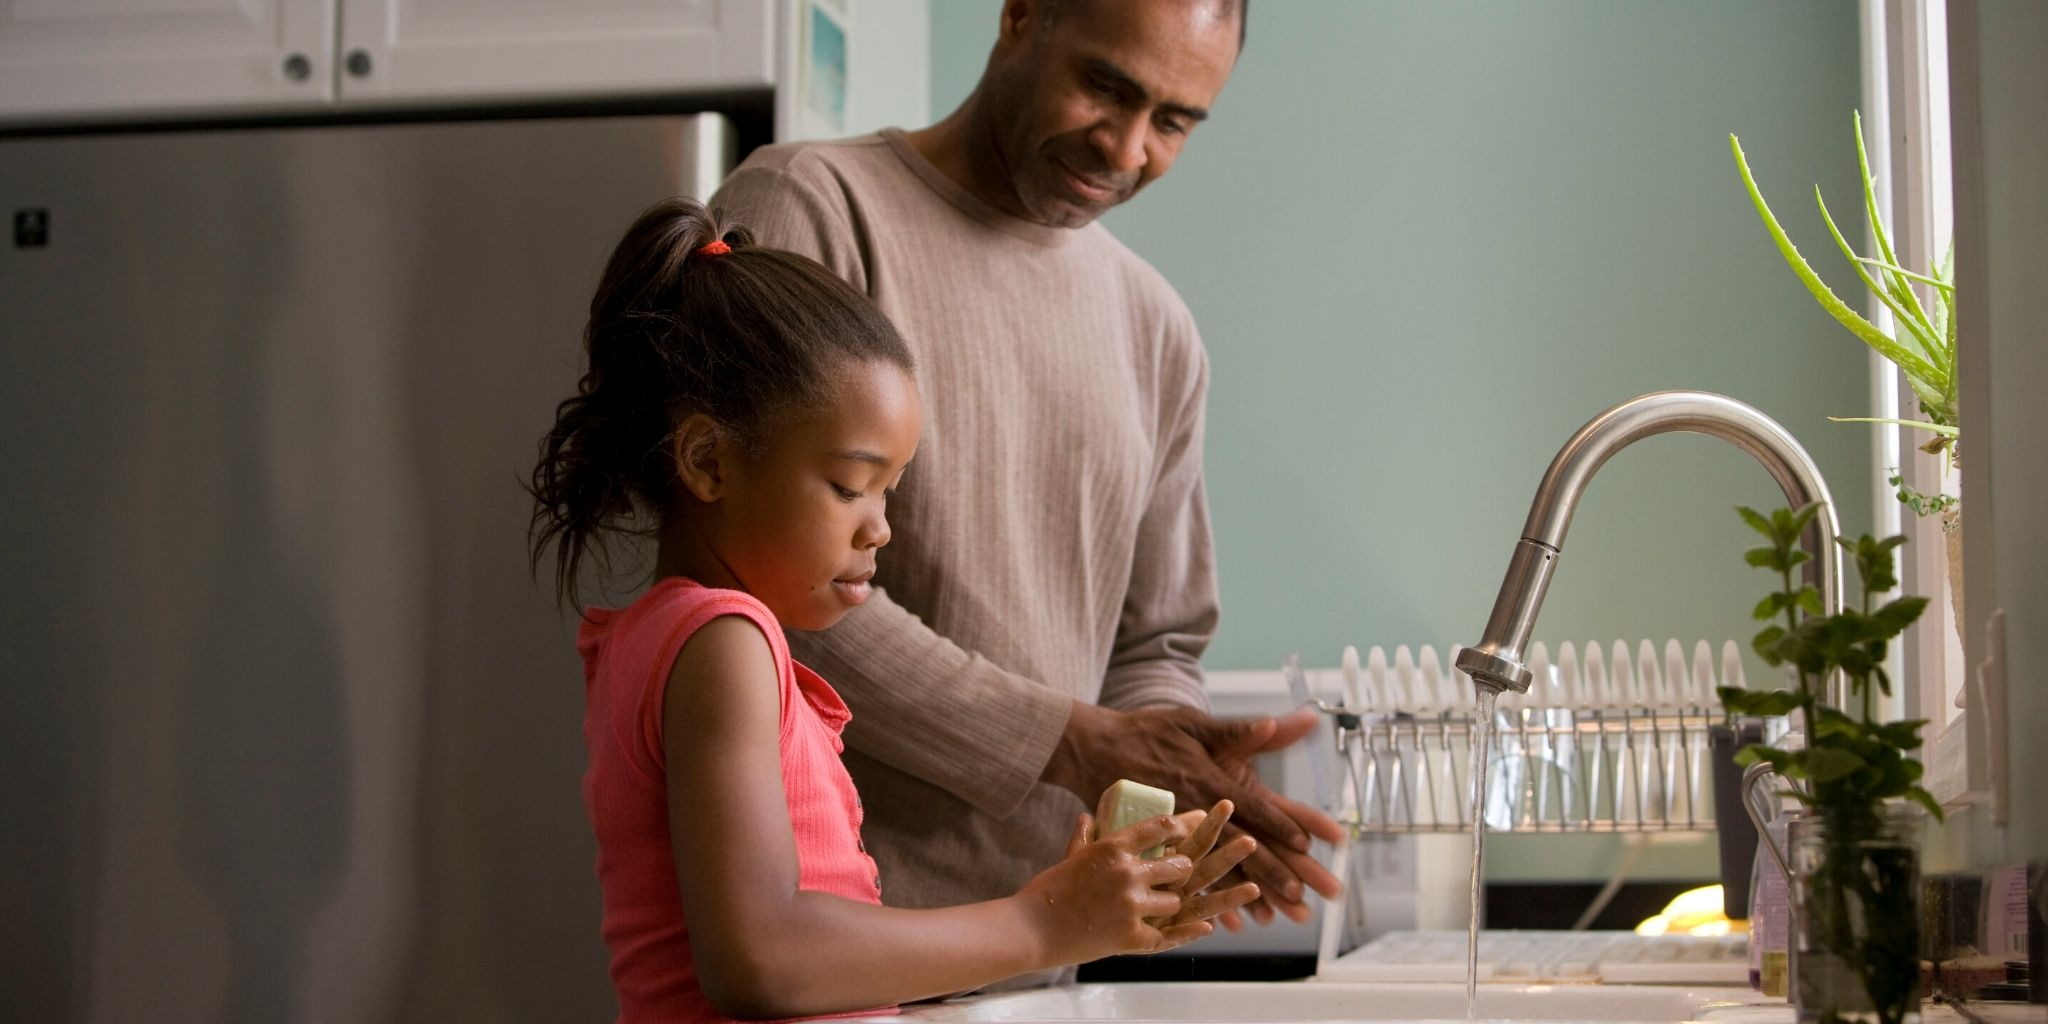 Lasten käsienpesu